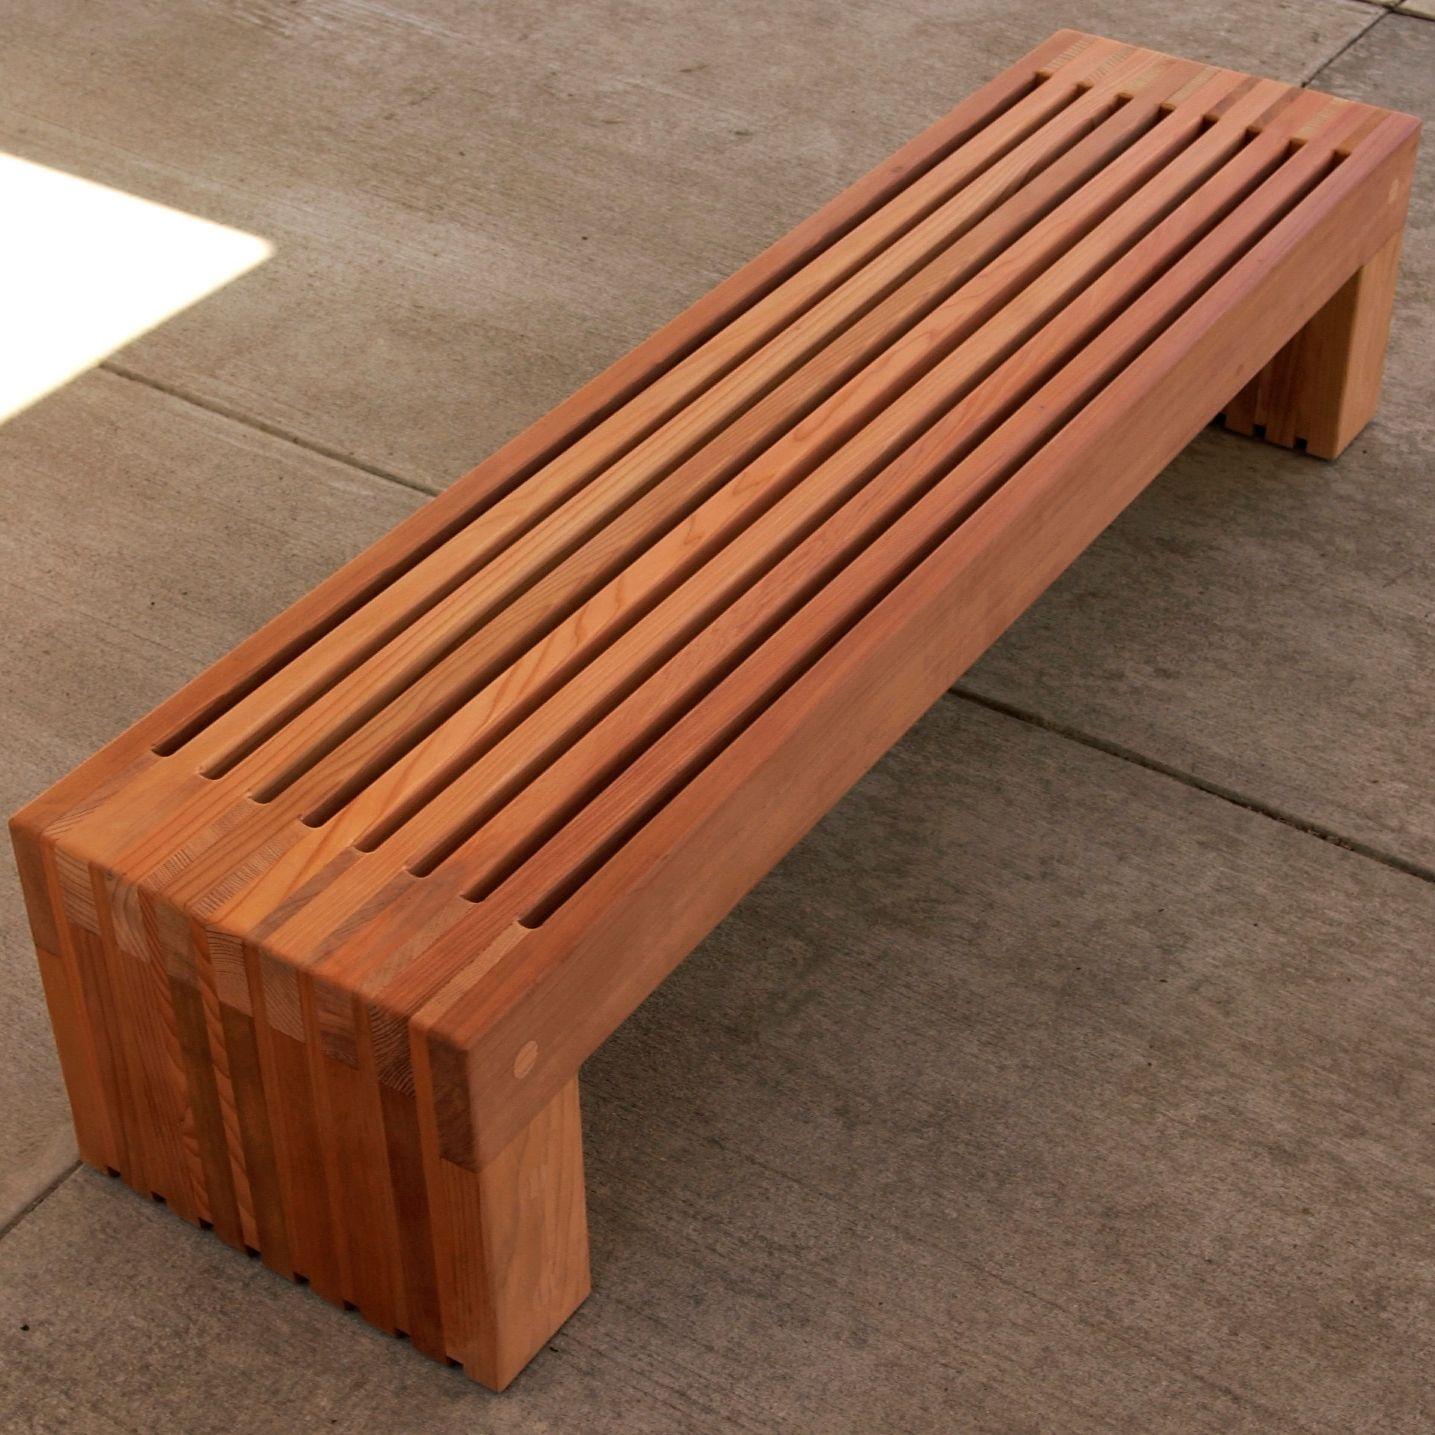 Remarkable Palisade Bench Artform Urban Artformurban Gamerscity Chair Design For Home Gamerscityorg